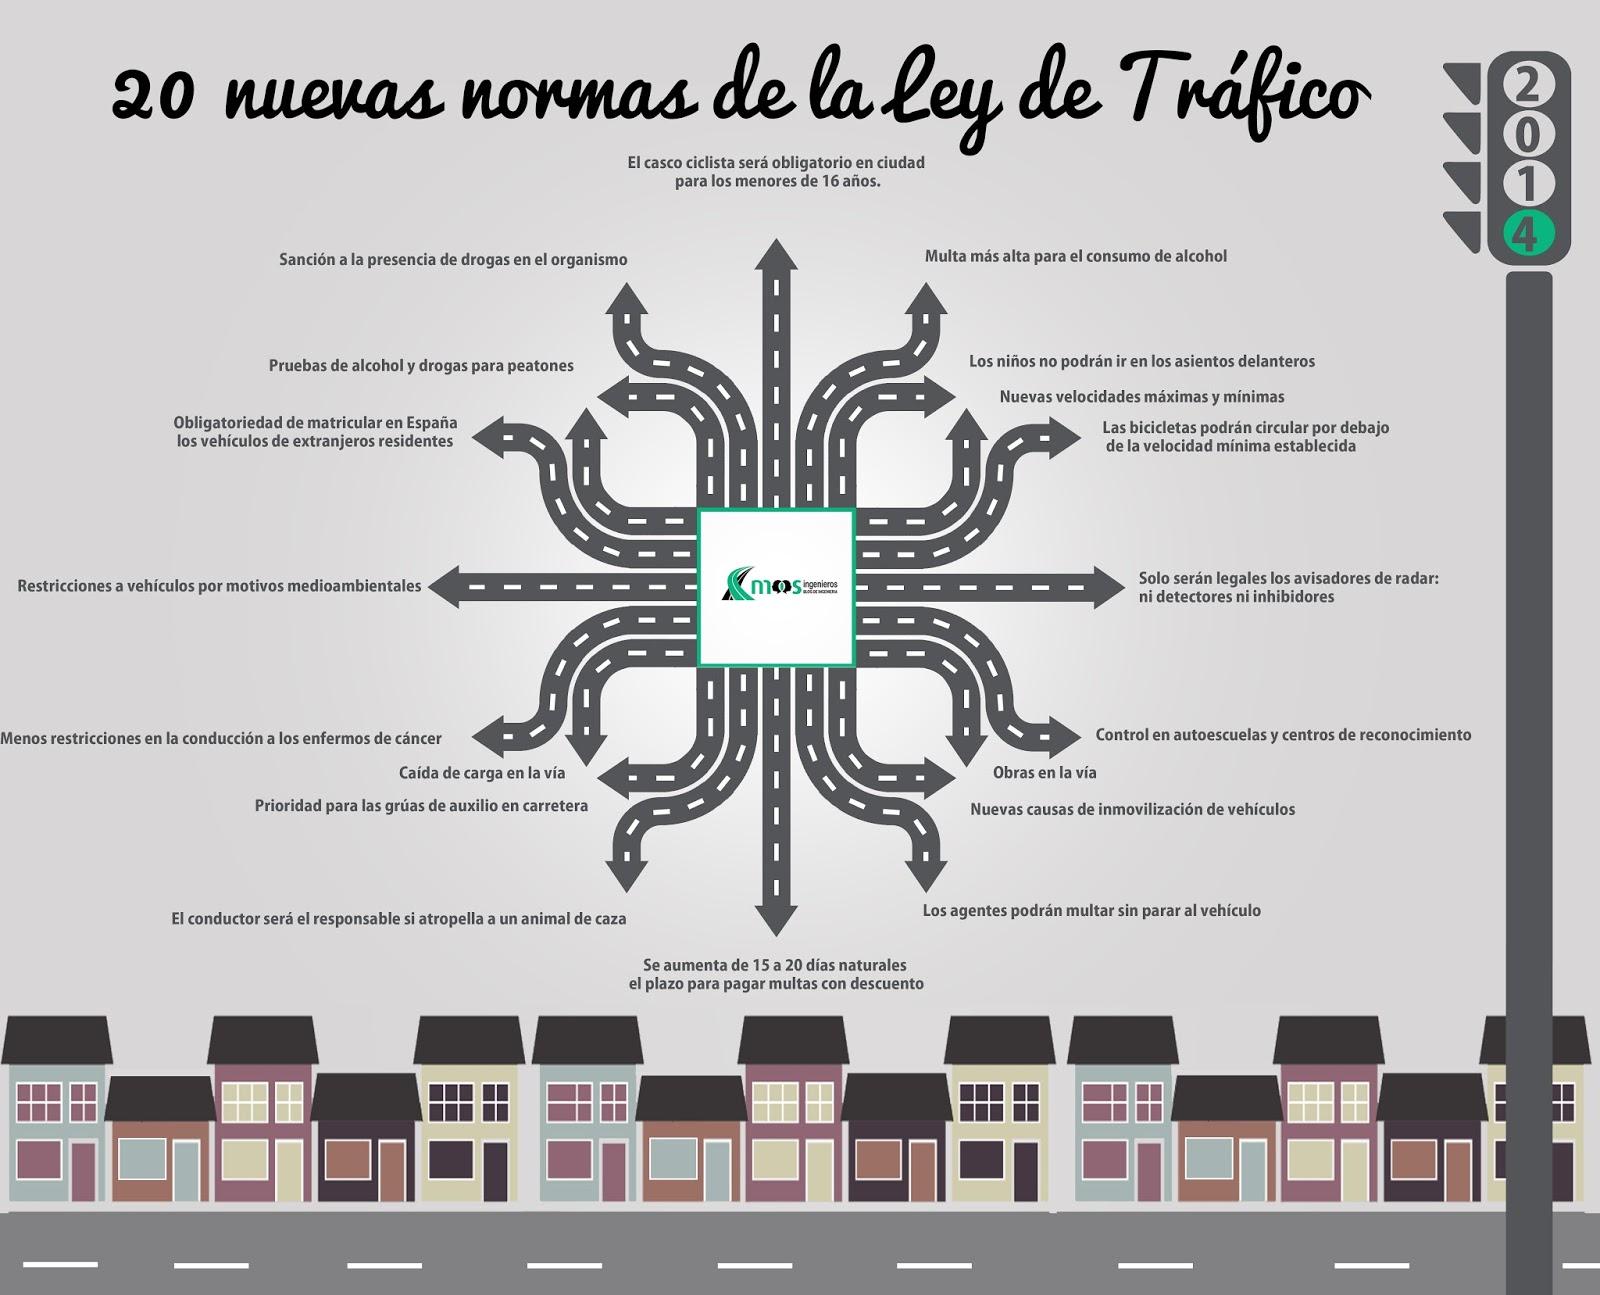 infografia-ley-trafico-2014-mosingenieros